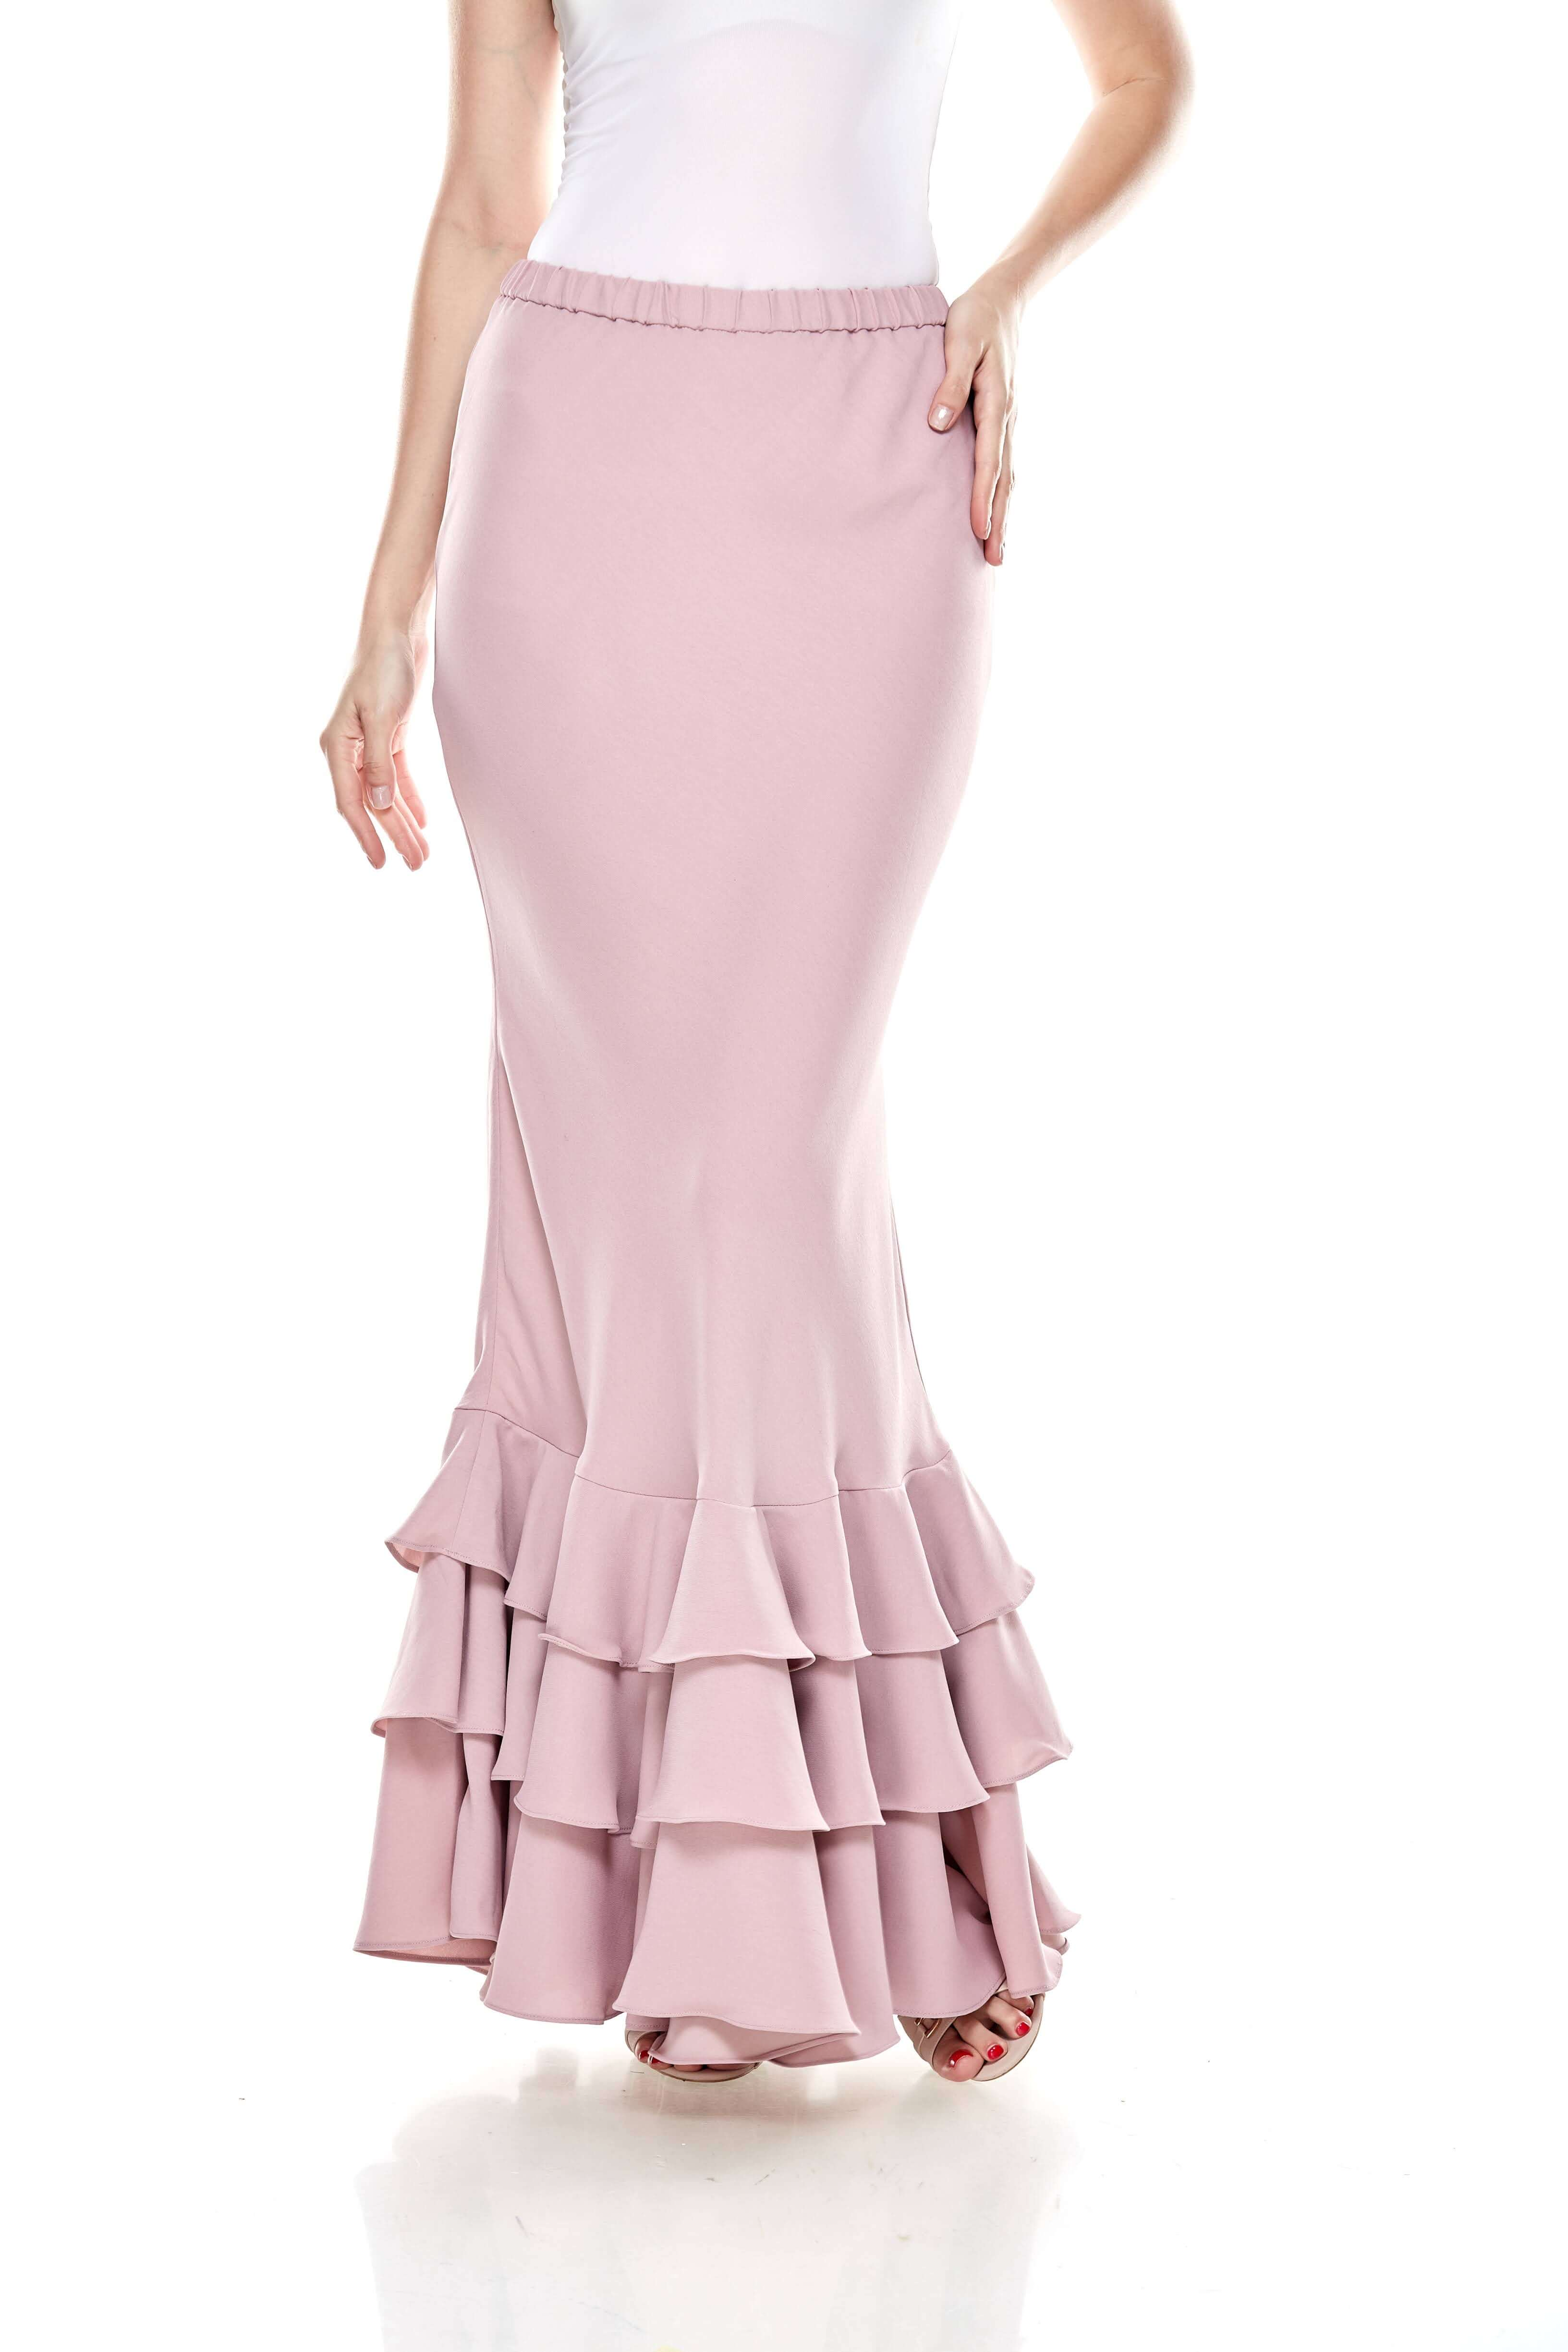 Rose Dawn Pink Ruffle Skirt (5)